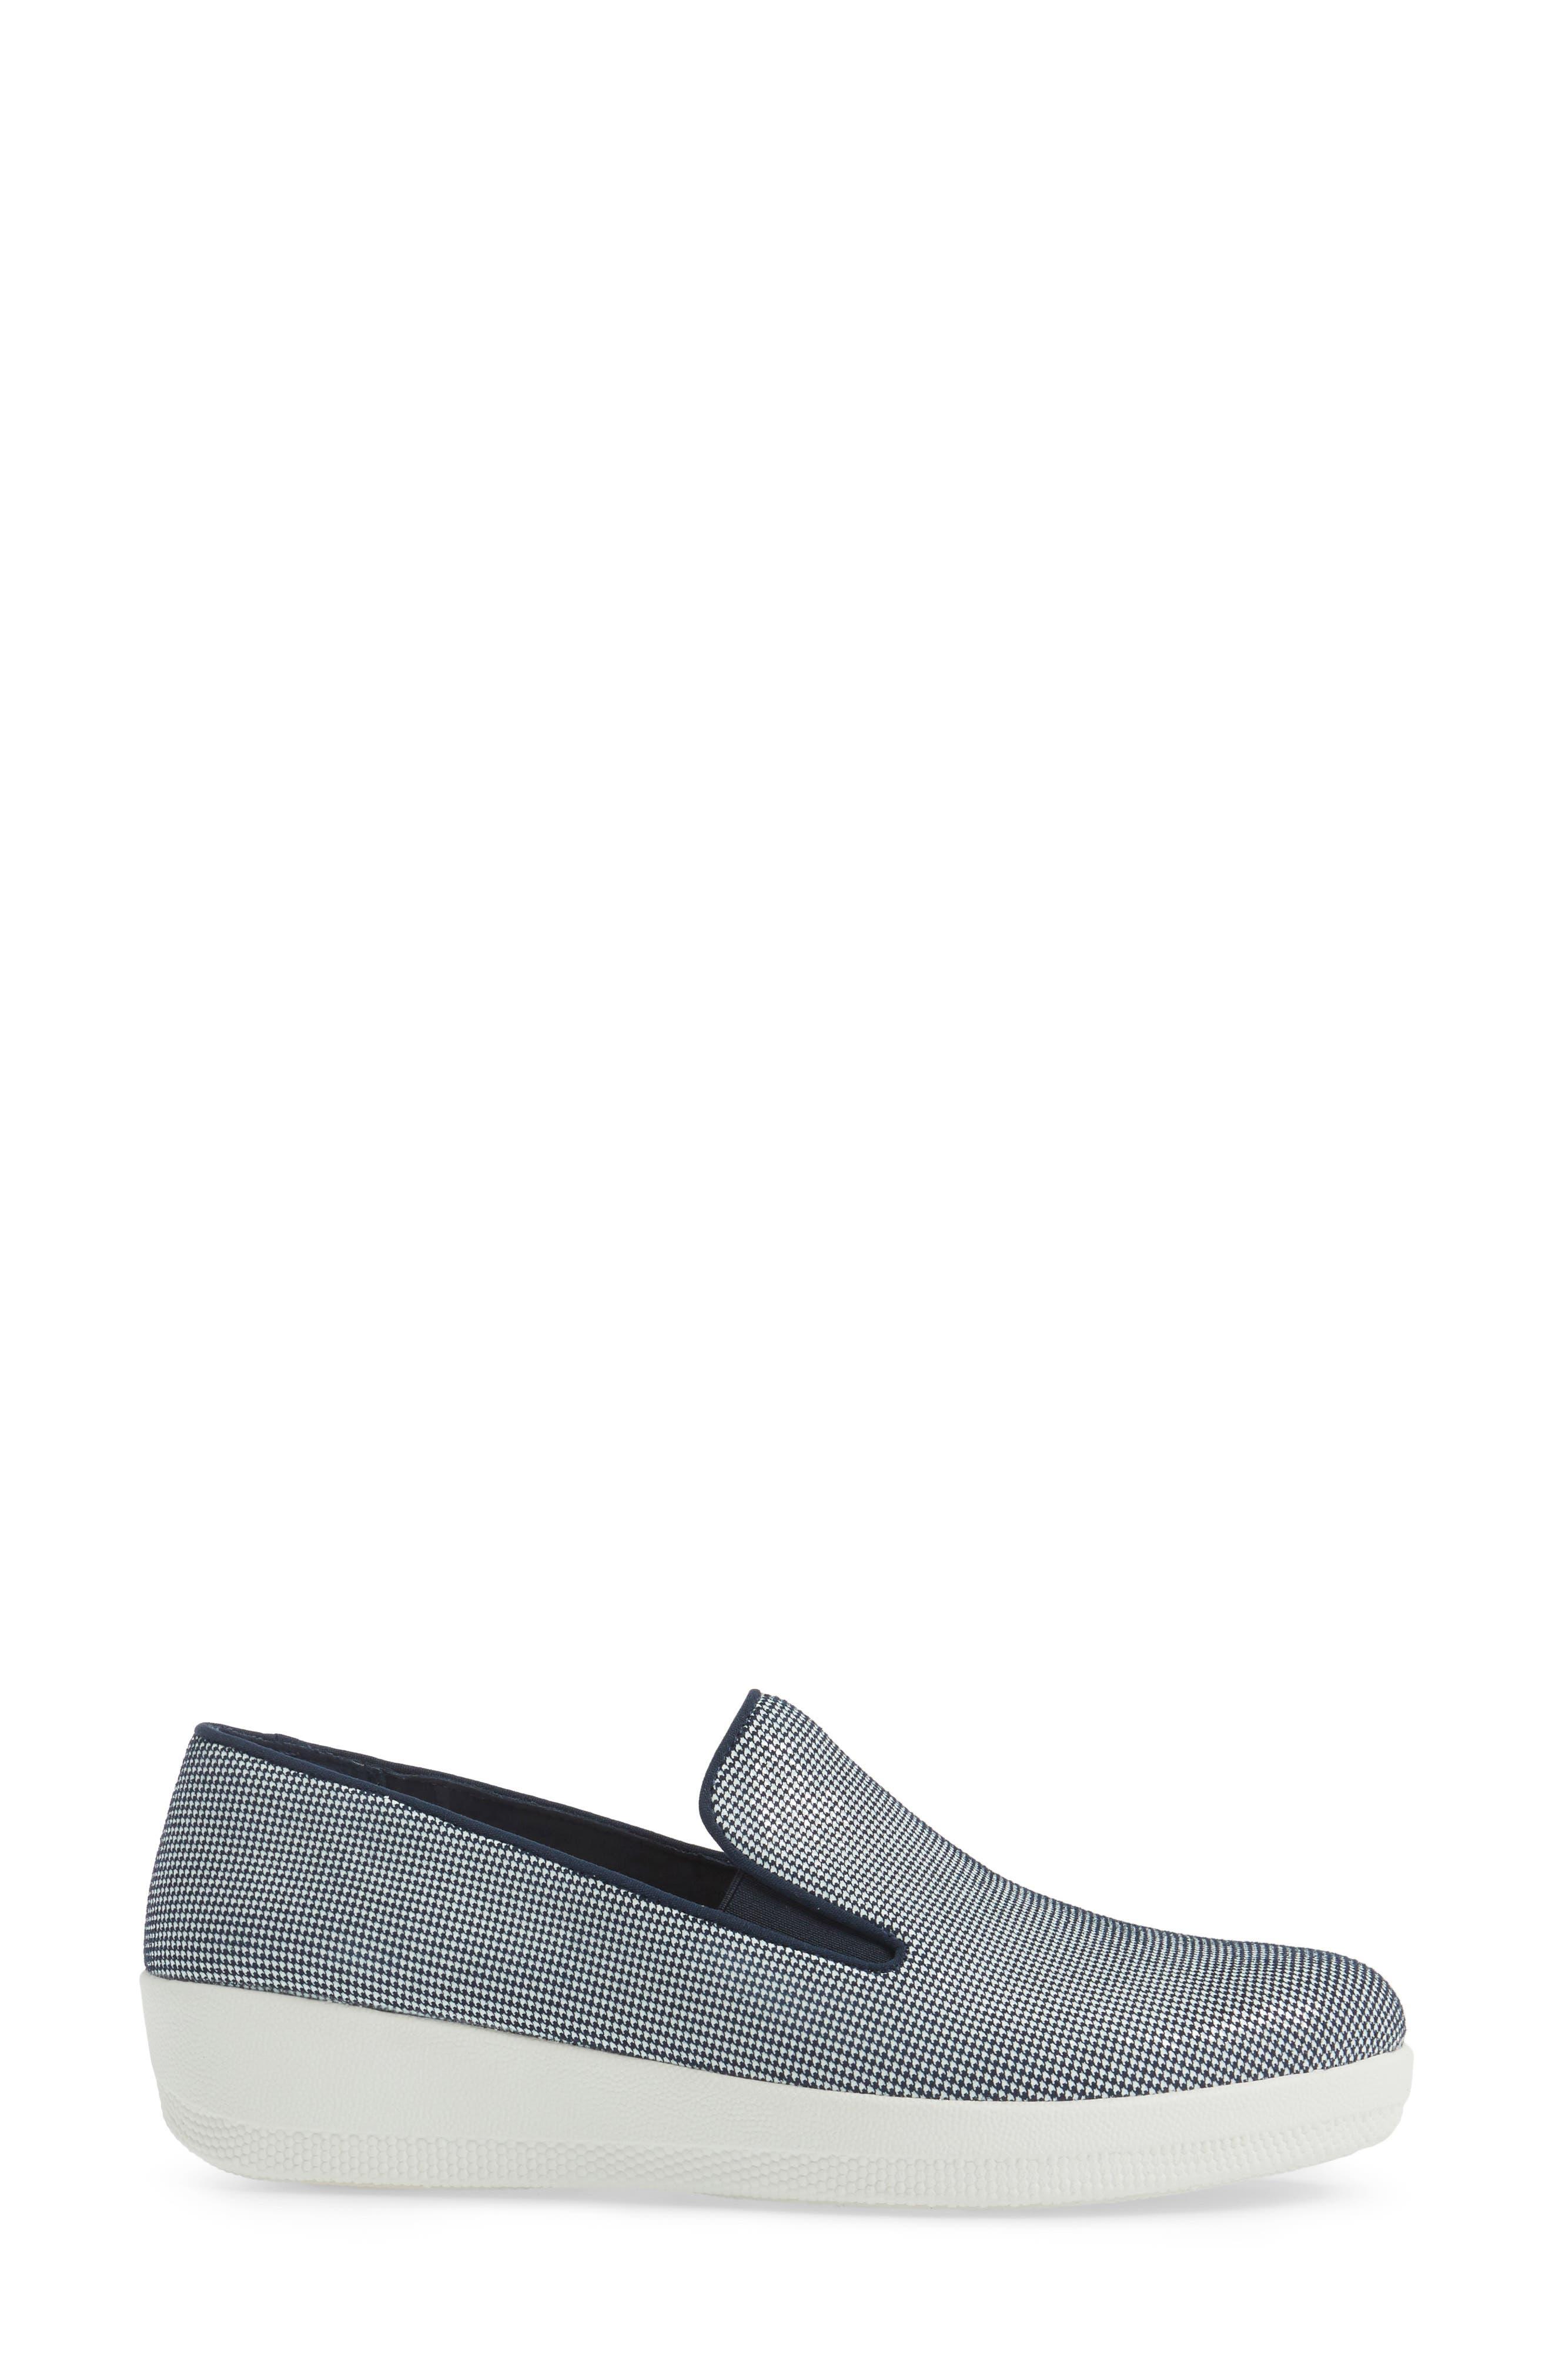 Houndstooth Superskate Sneaker,                             Alternate thumbnail 11, color,